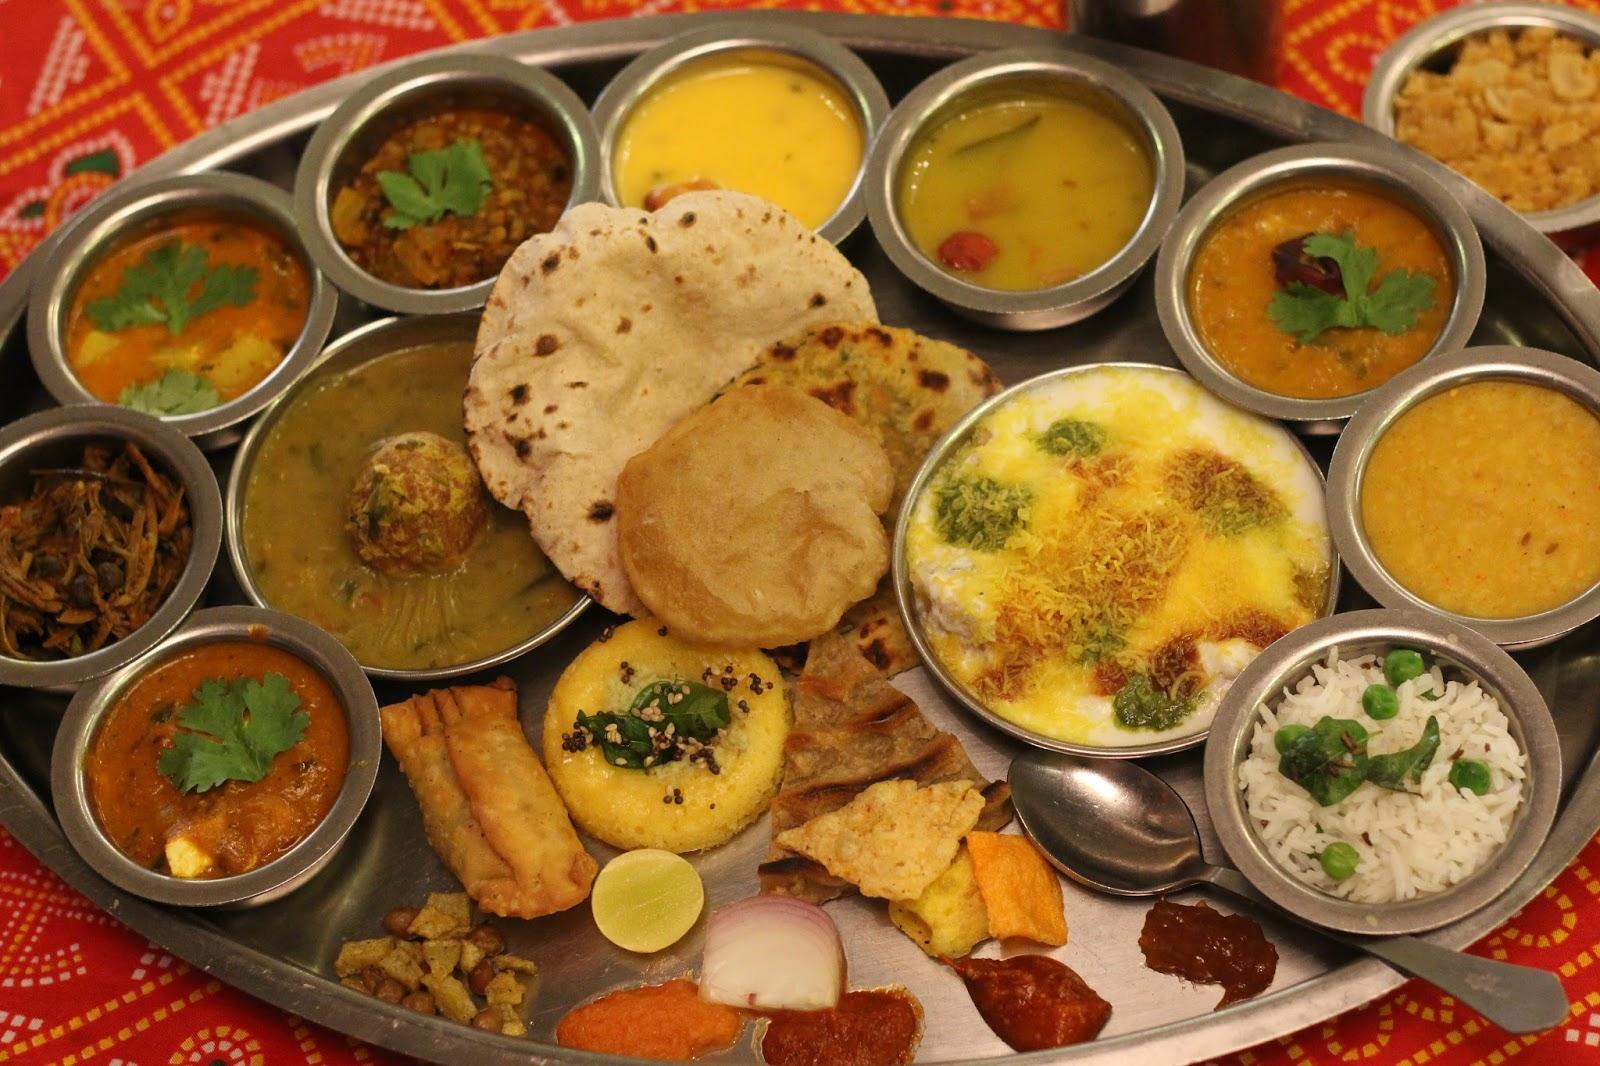 Atithi devo bhava raj dhani indian food express for Atithi indian cuisine